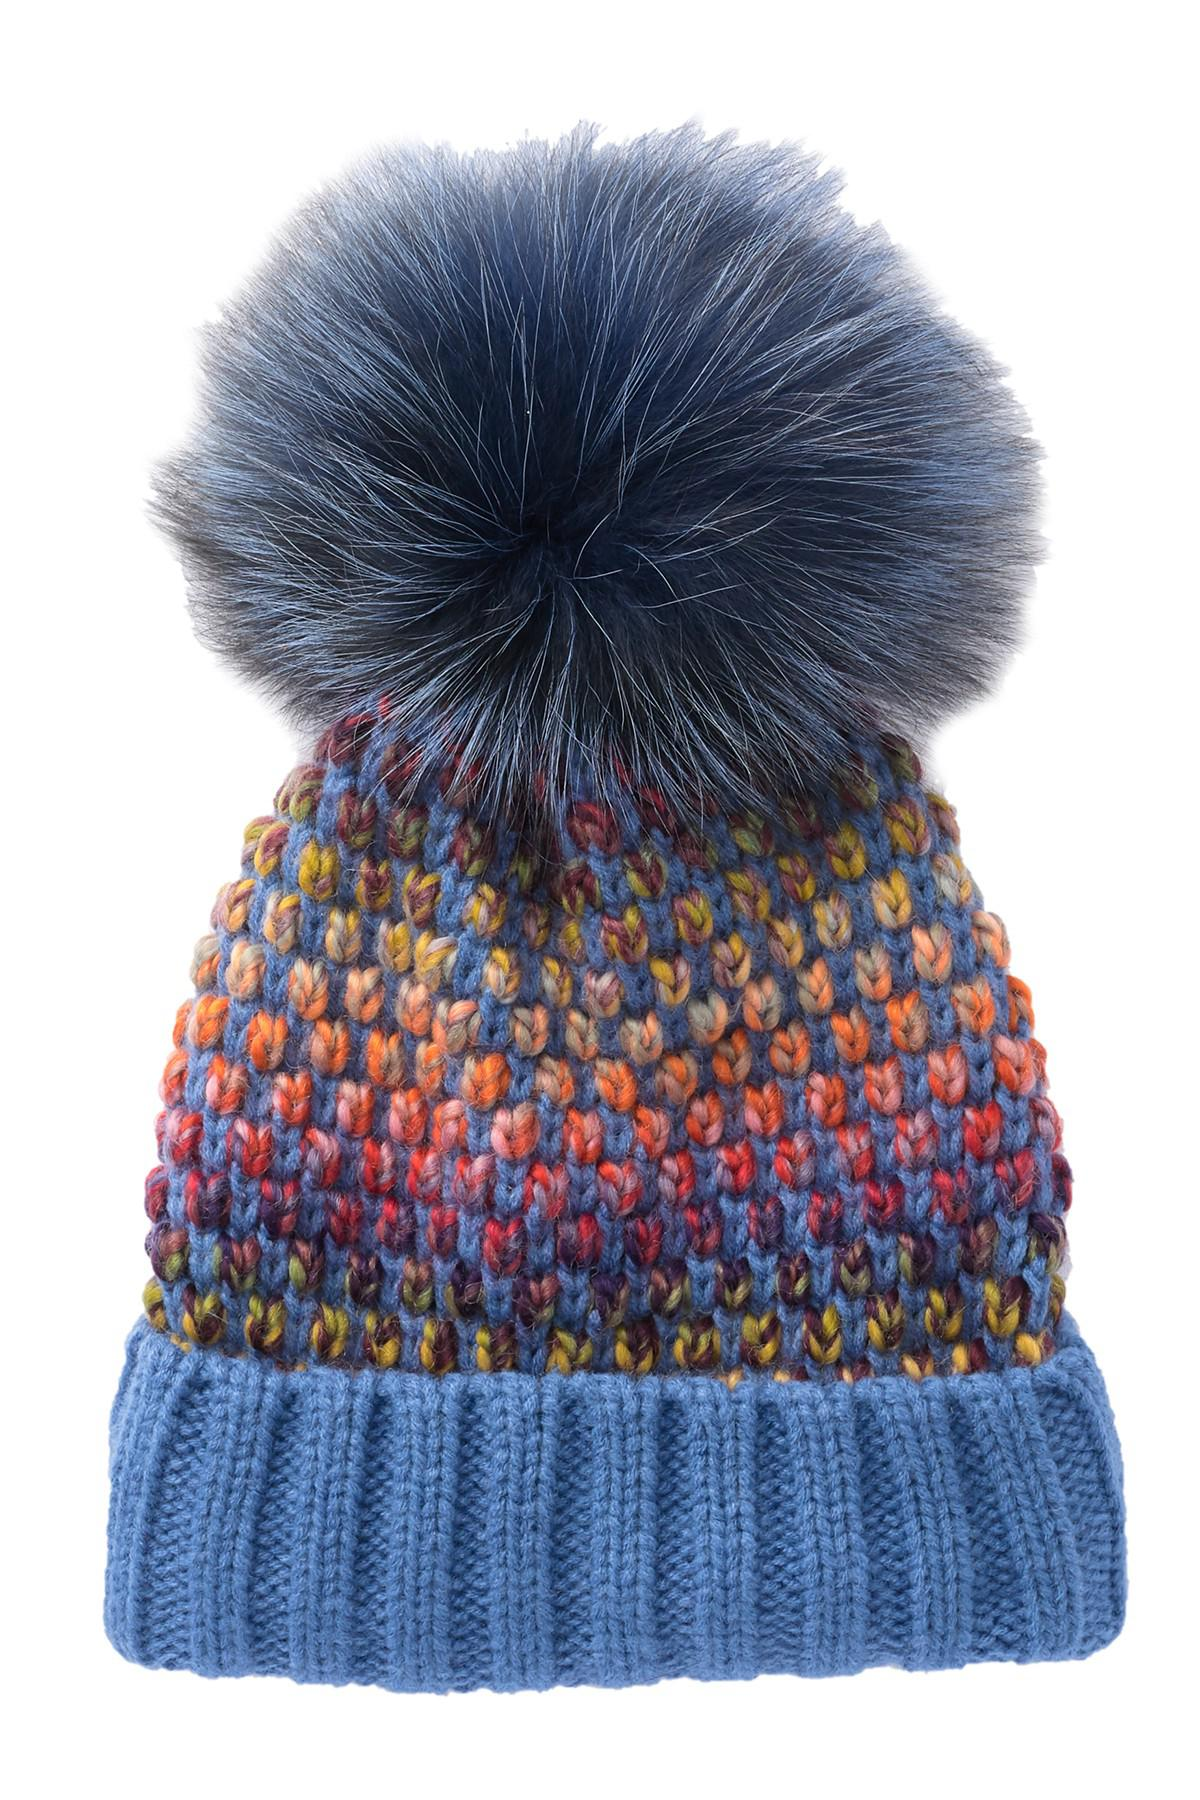 7e8c5338ce2a8 Lyst - Kyi Kyi Genuine Fox Fur Pompom Multi Knit Beanie in Blue